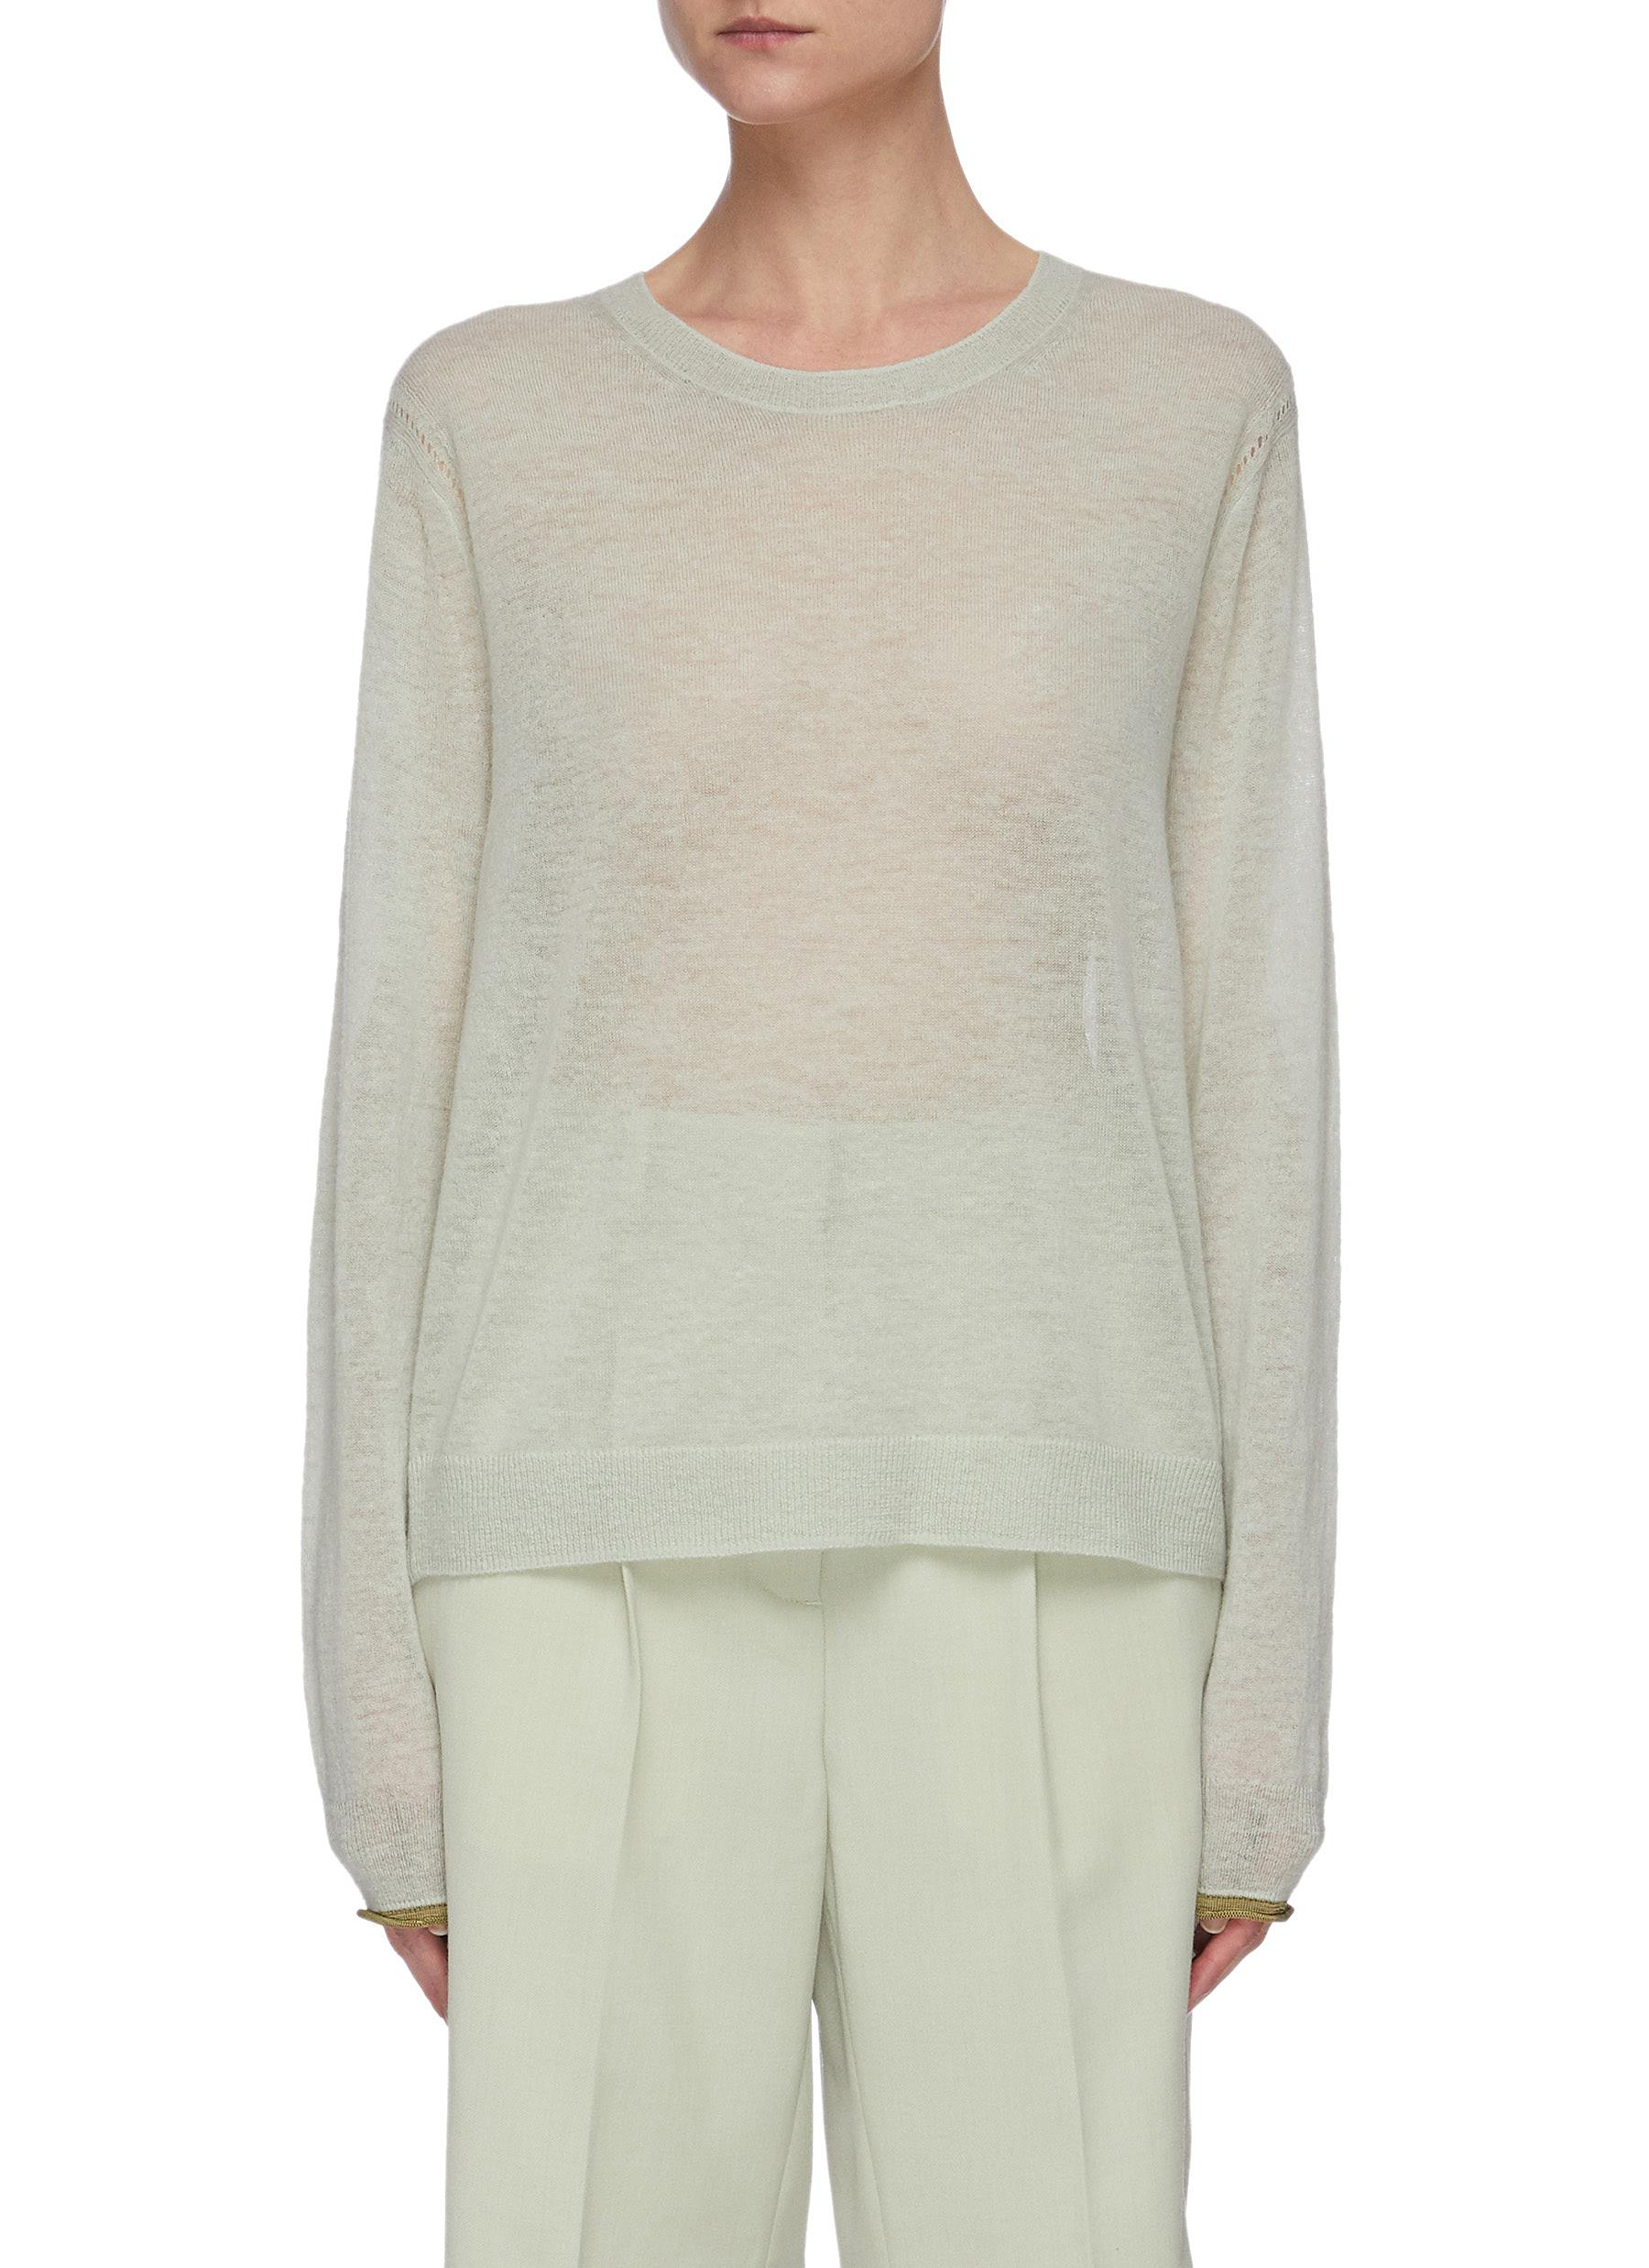 Buy Acne Studios Knitwear Semi-sheer knit T-shirt